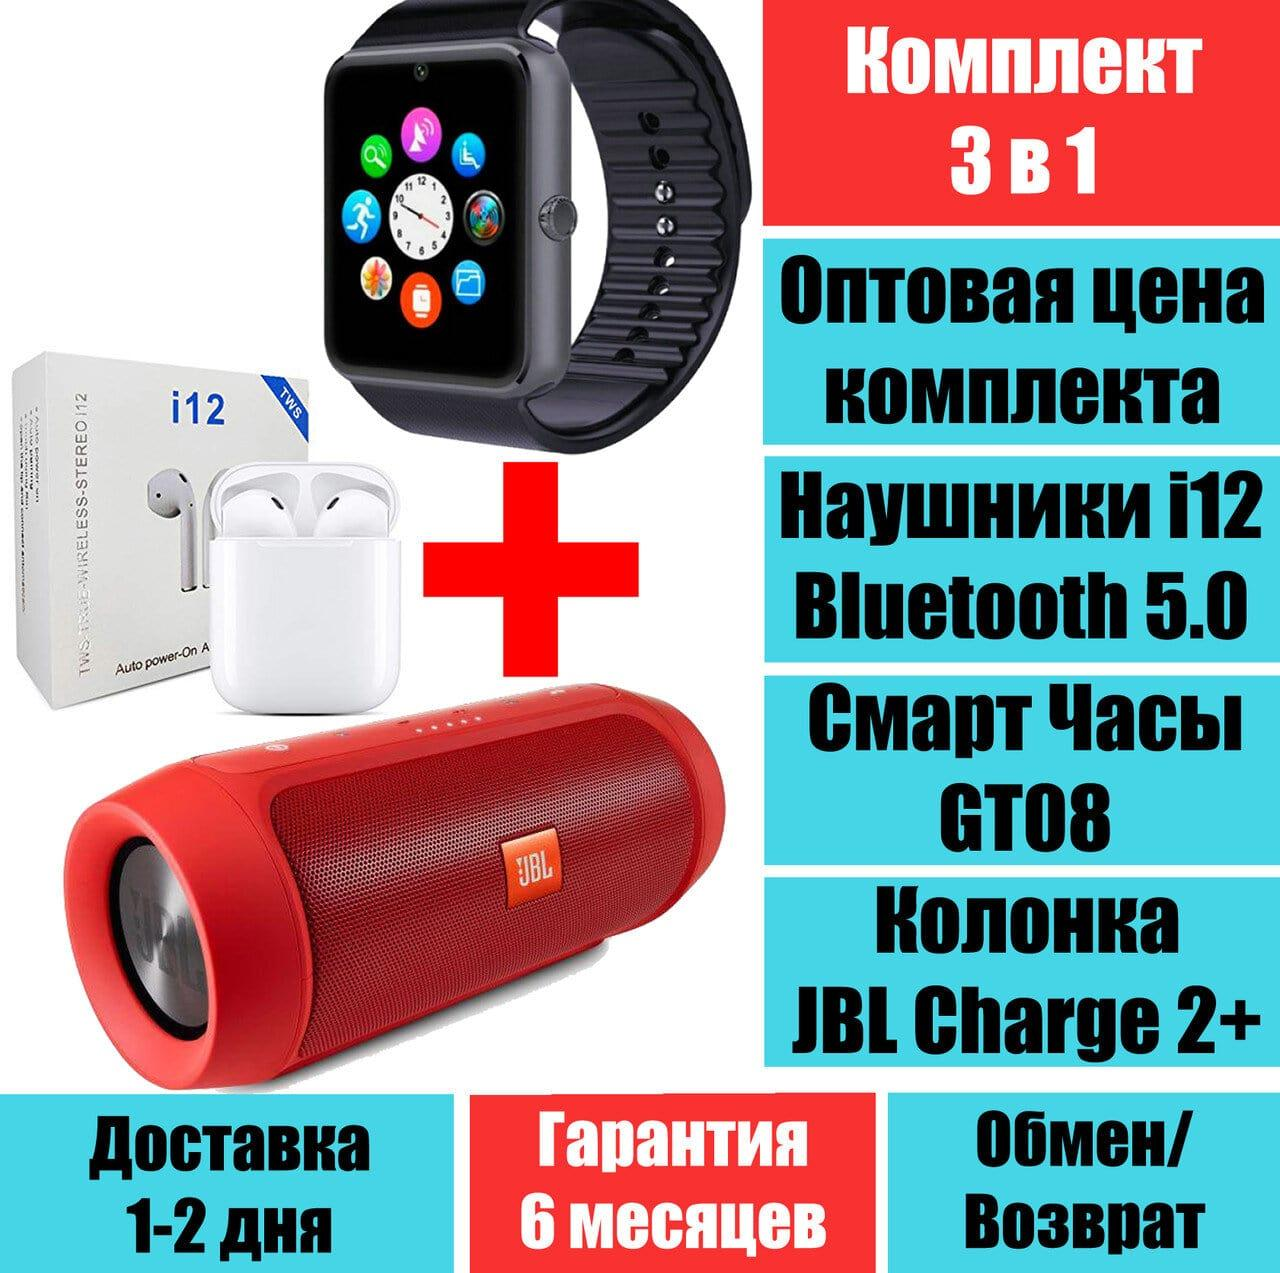 Колонка JBL Charge 2+ Розумні годинник Smart Watch GT08 + навушники i12 TWS Bluetooth 5.0 (Комплект)